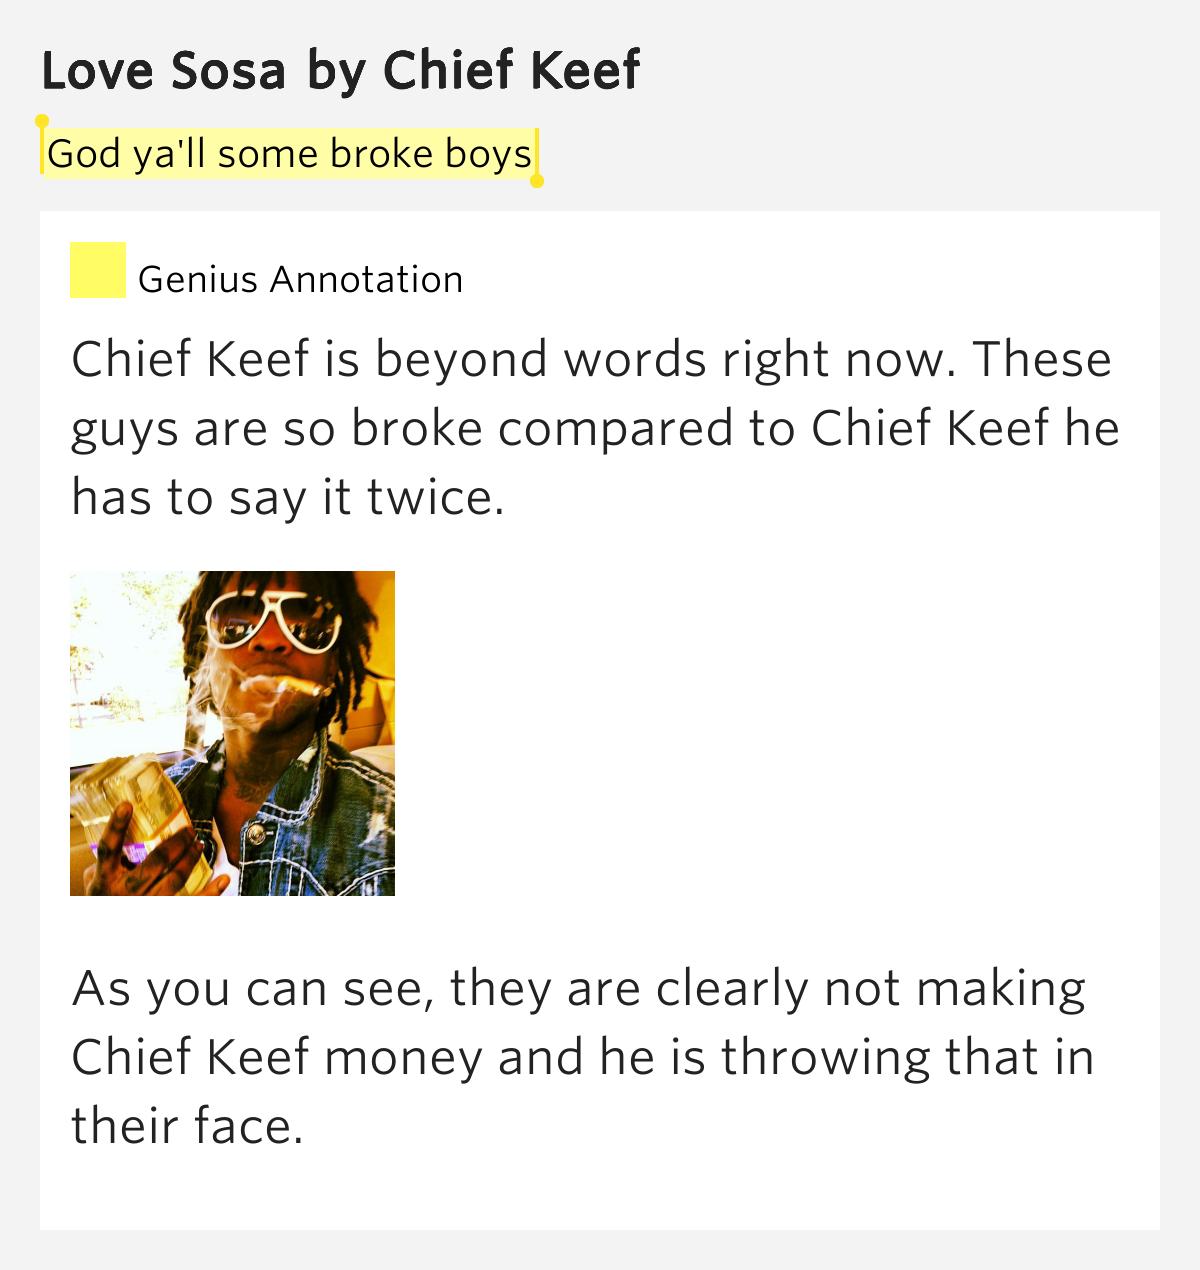 Chief Keef Love Sosa: God Ya'll Some Broke Boys